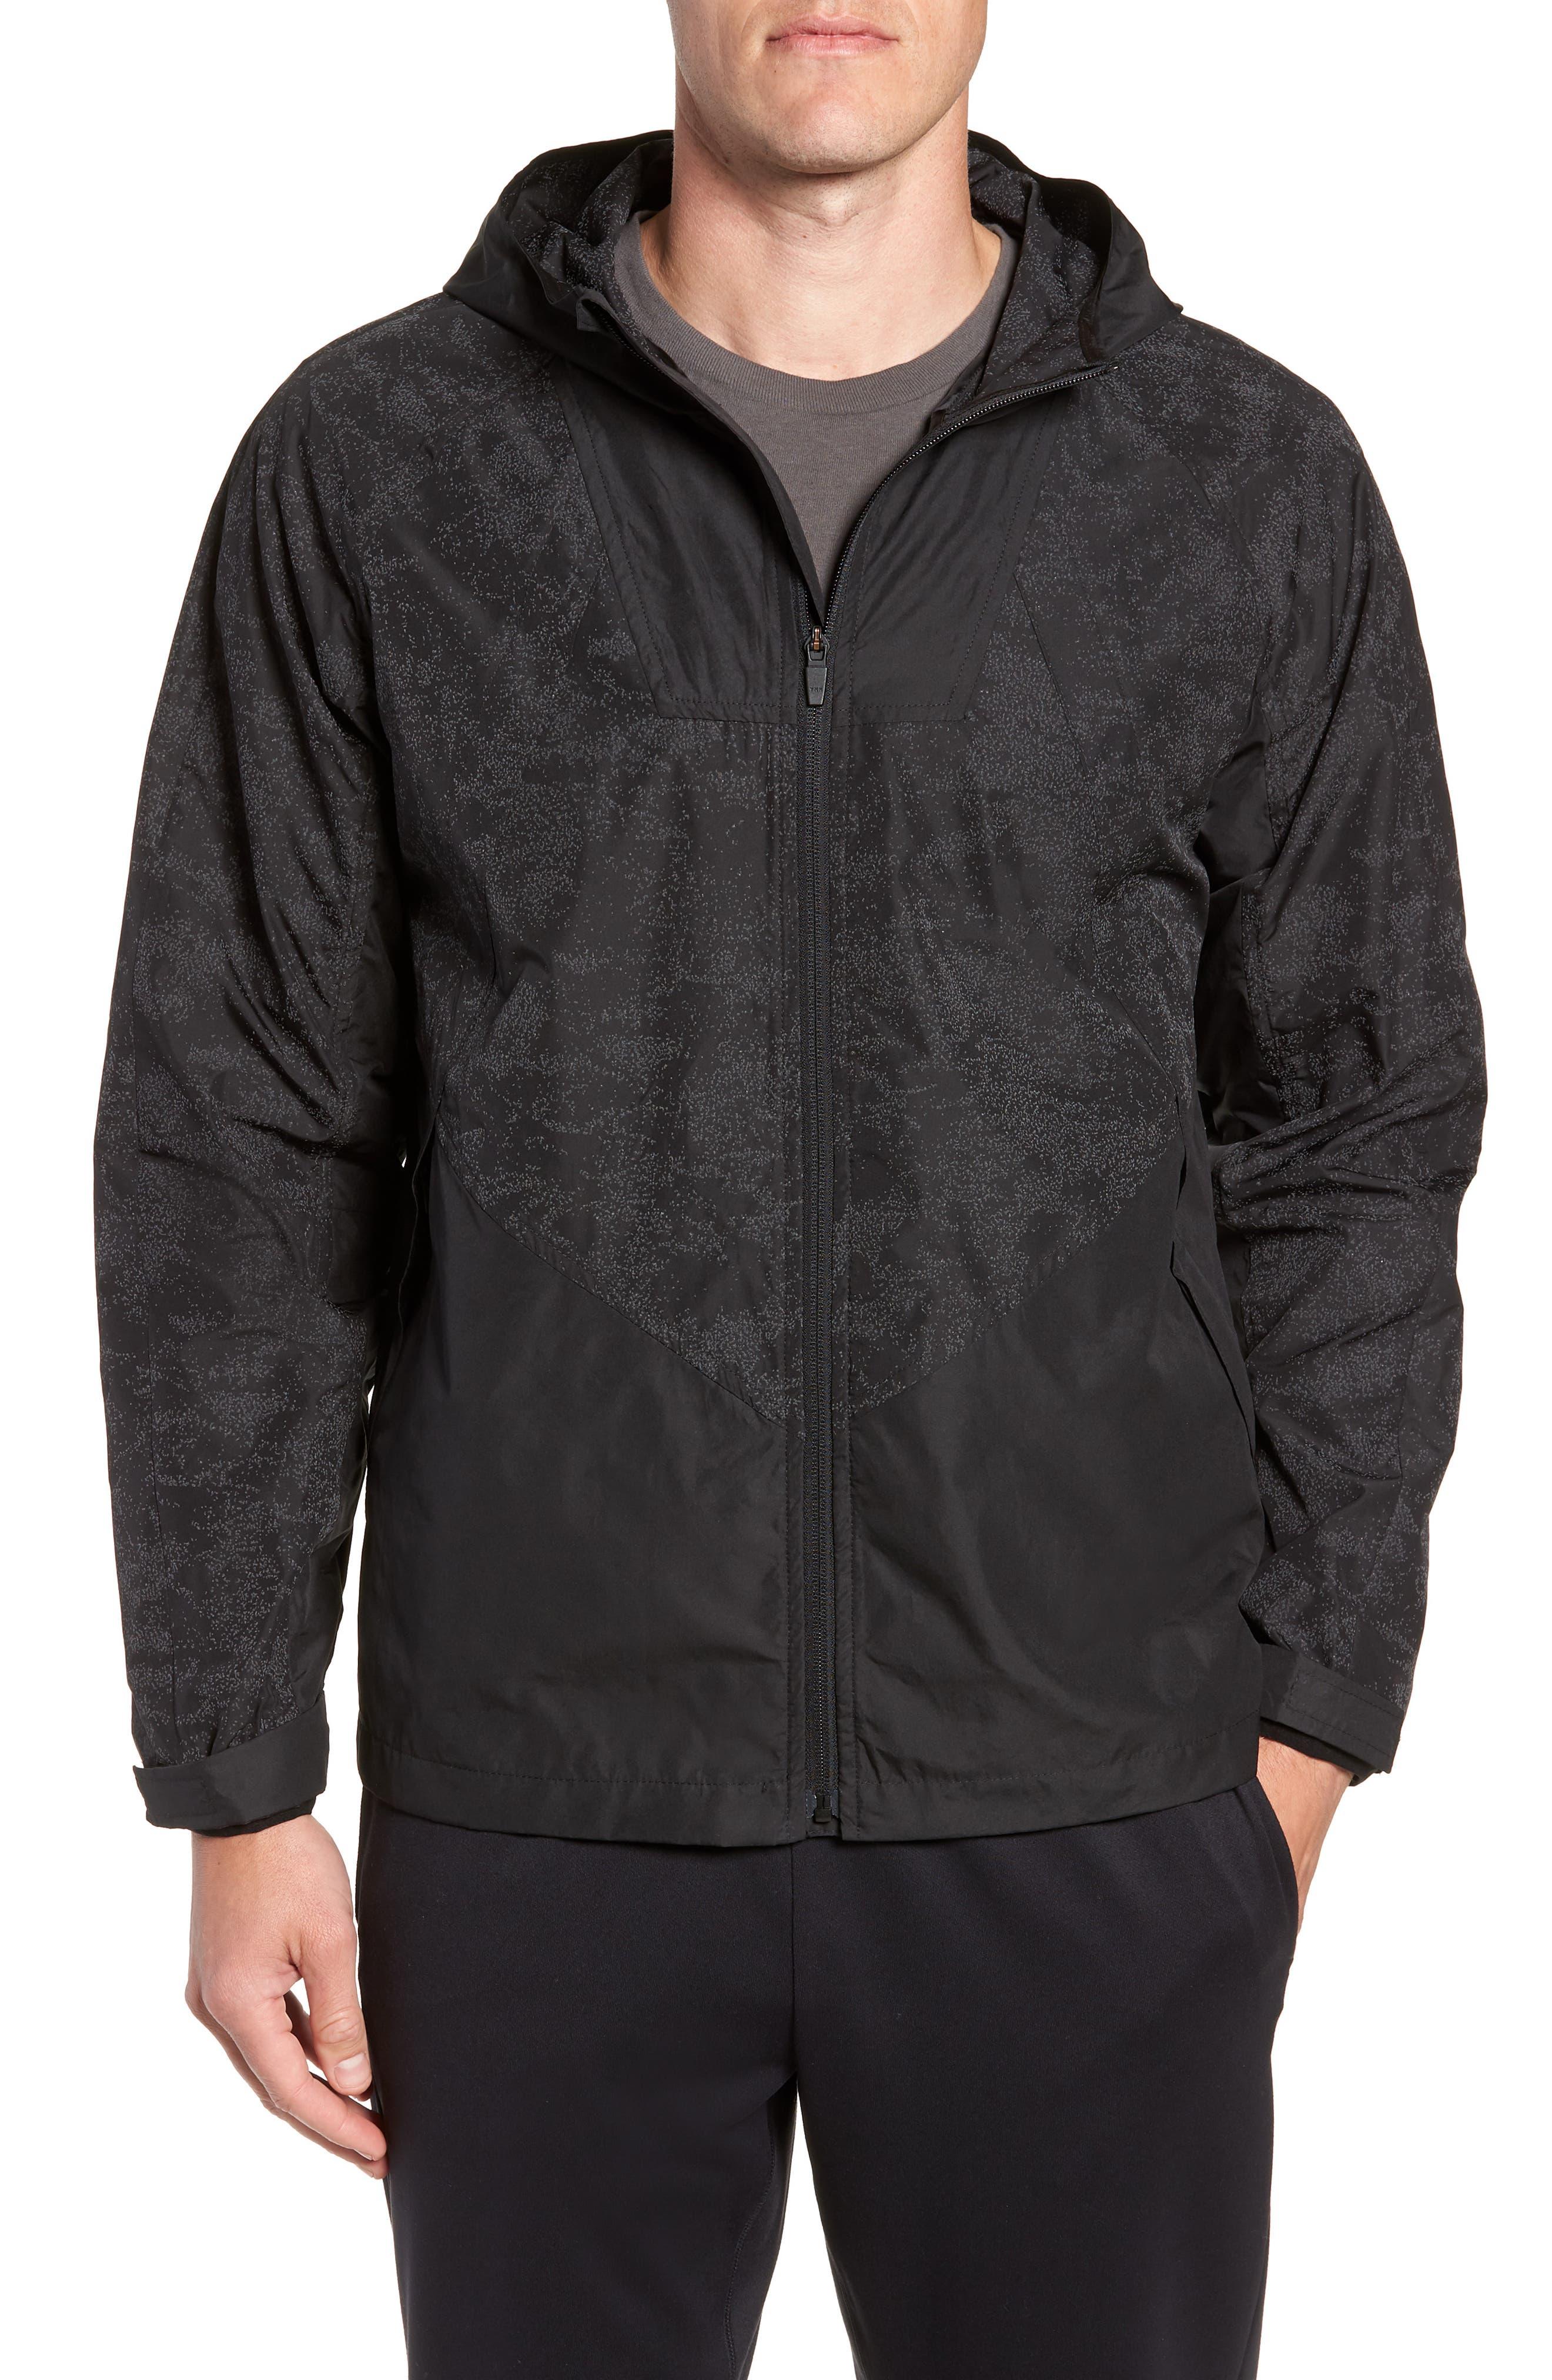 Hooded Reflective Jacket,                             Main thumbnail 1, color,                             BLACK REFLECTIVE